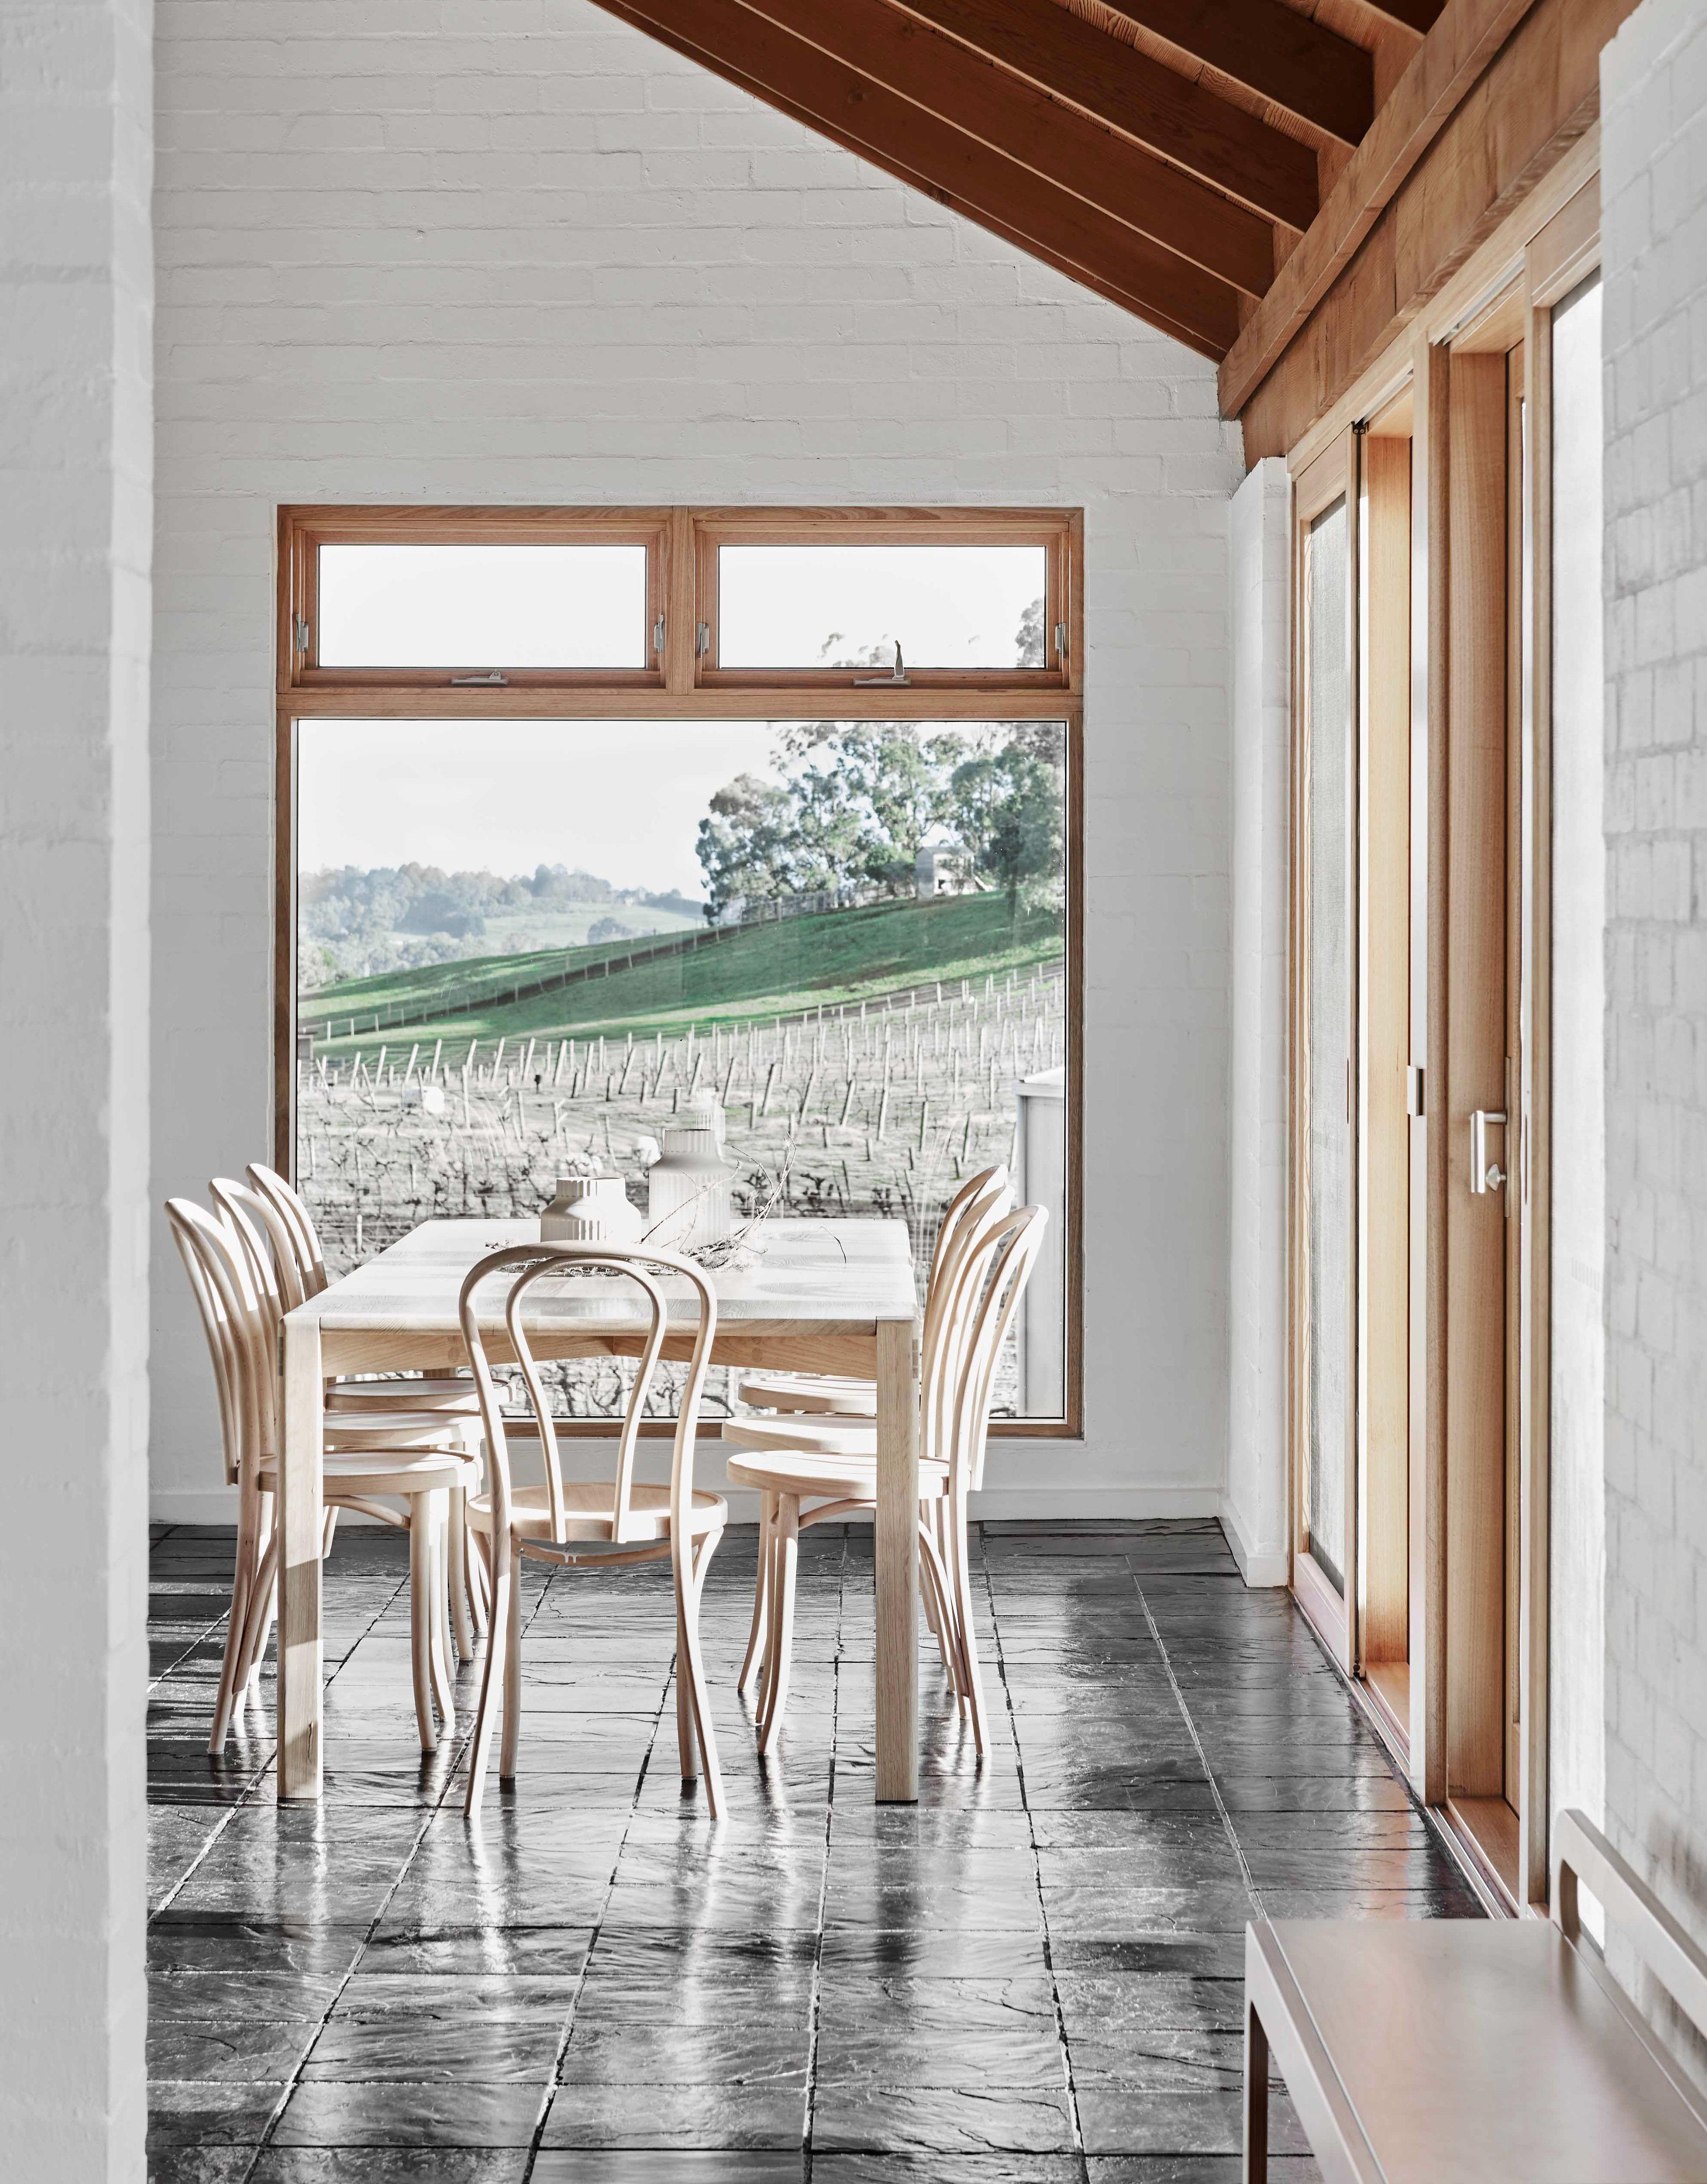 Home inspiration interior design decor interiors magazine minimal minimalist homes summer also est issue in inspiring rh pinterest